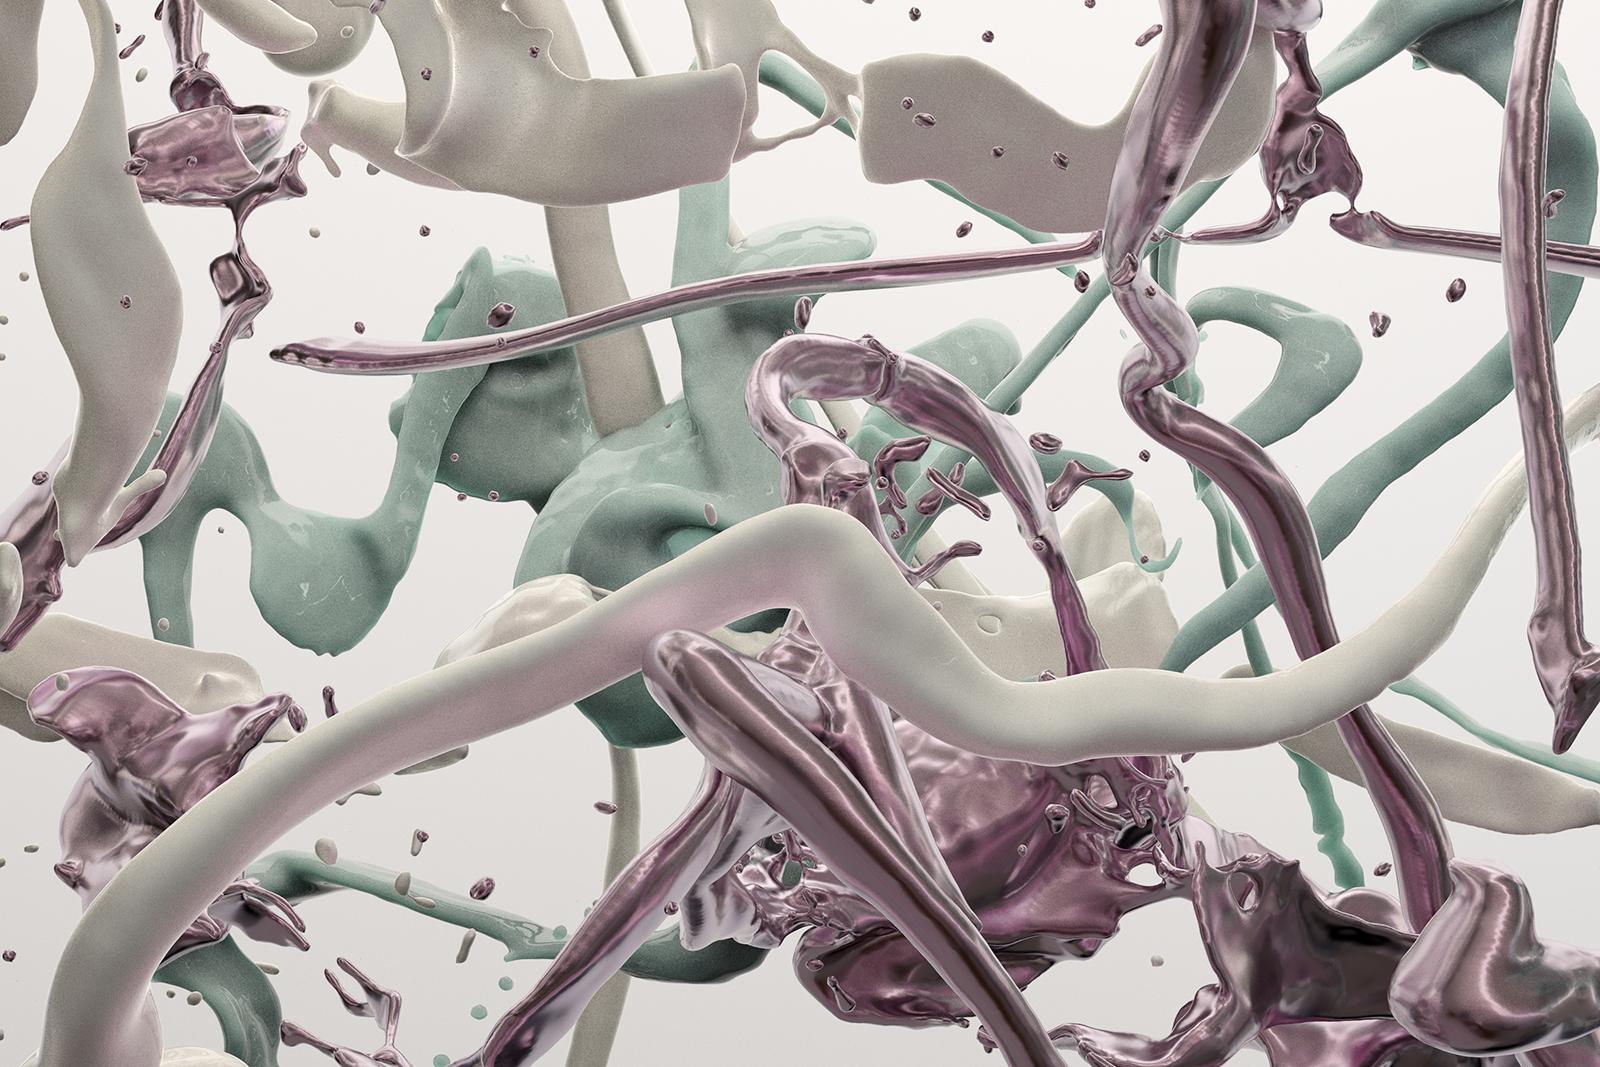 Bodypaint V 25, CGI Fine Art Print, 70 x 105 cm, 2020